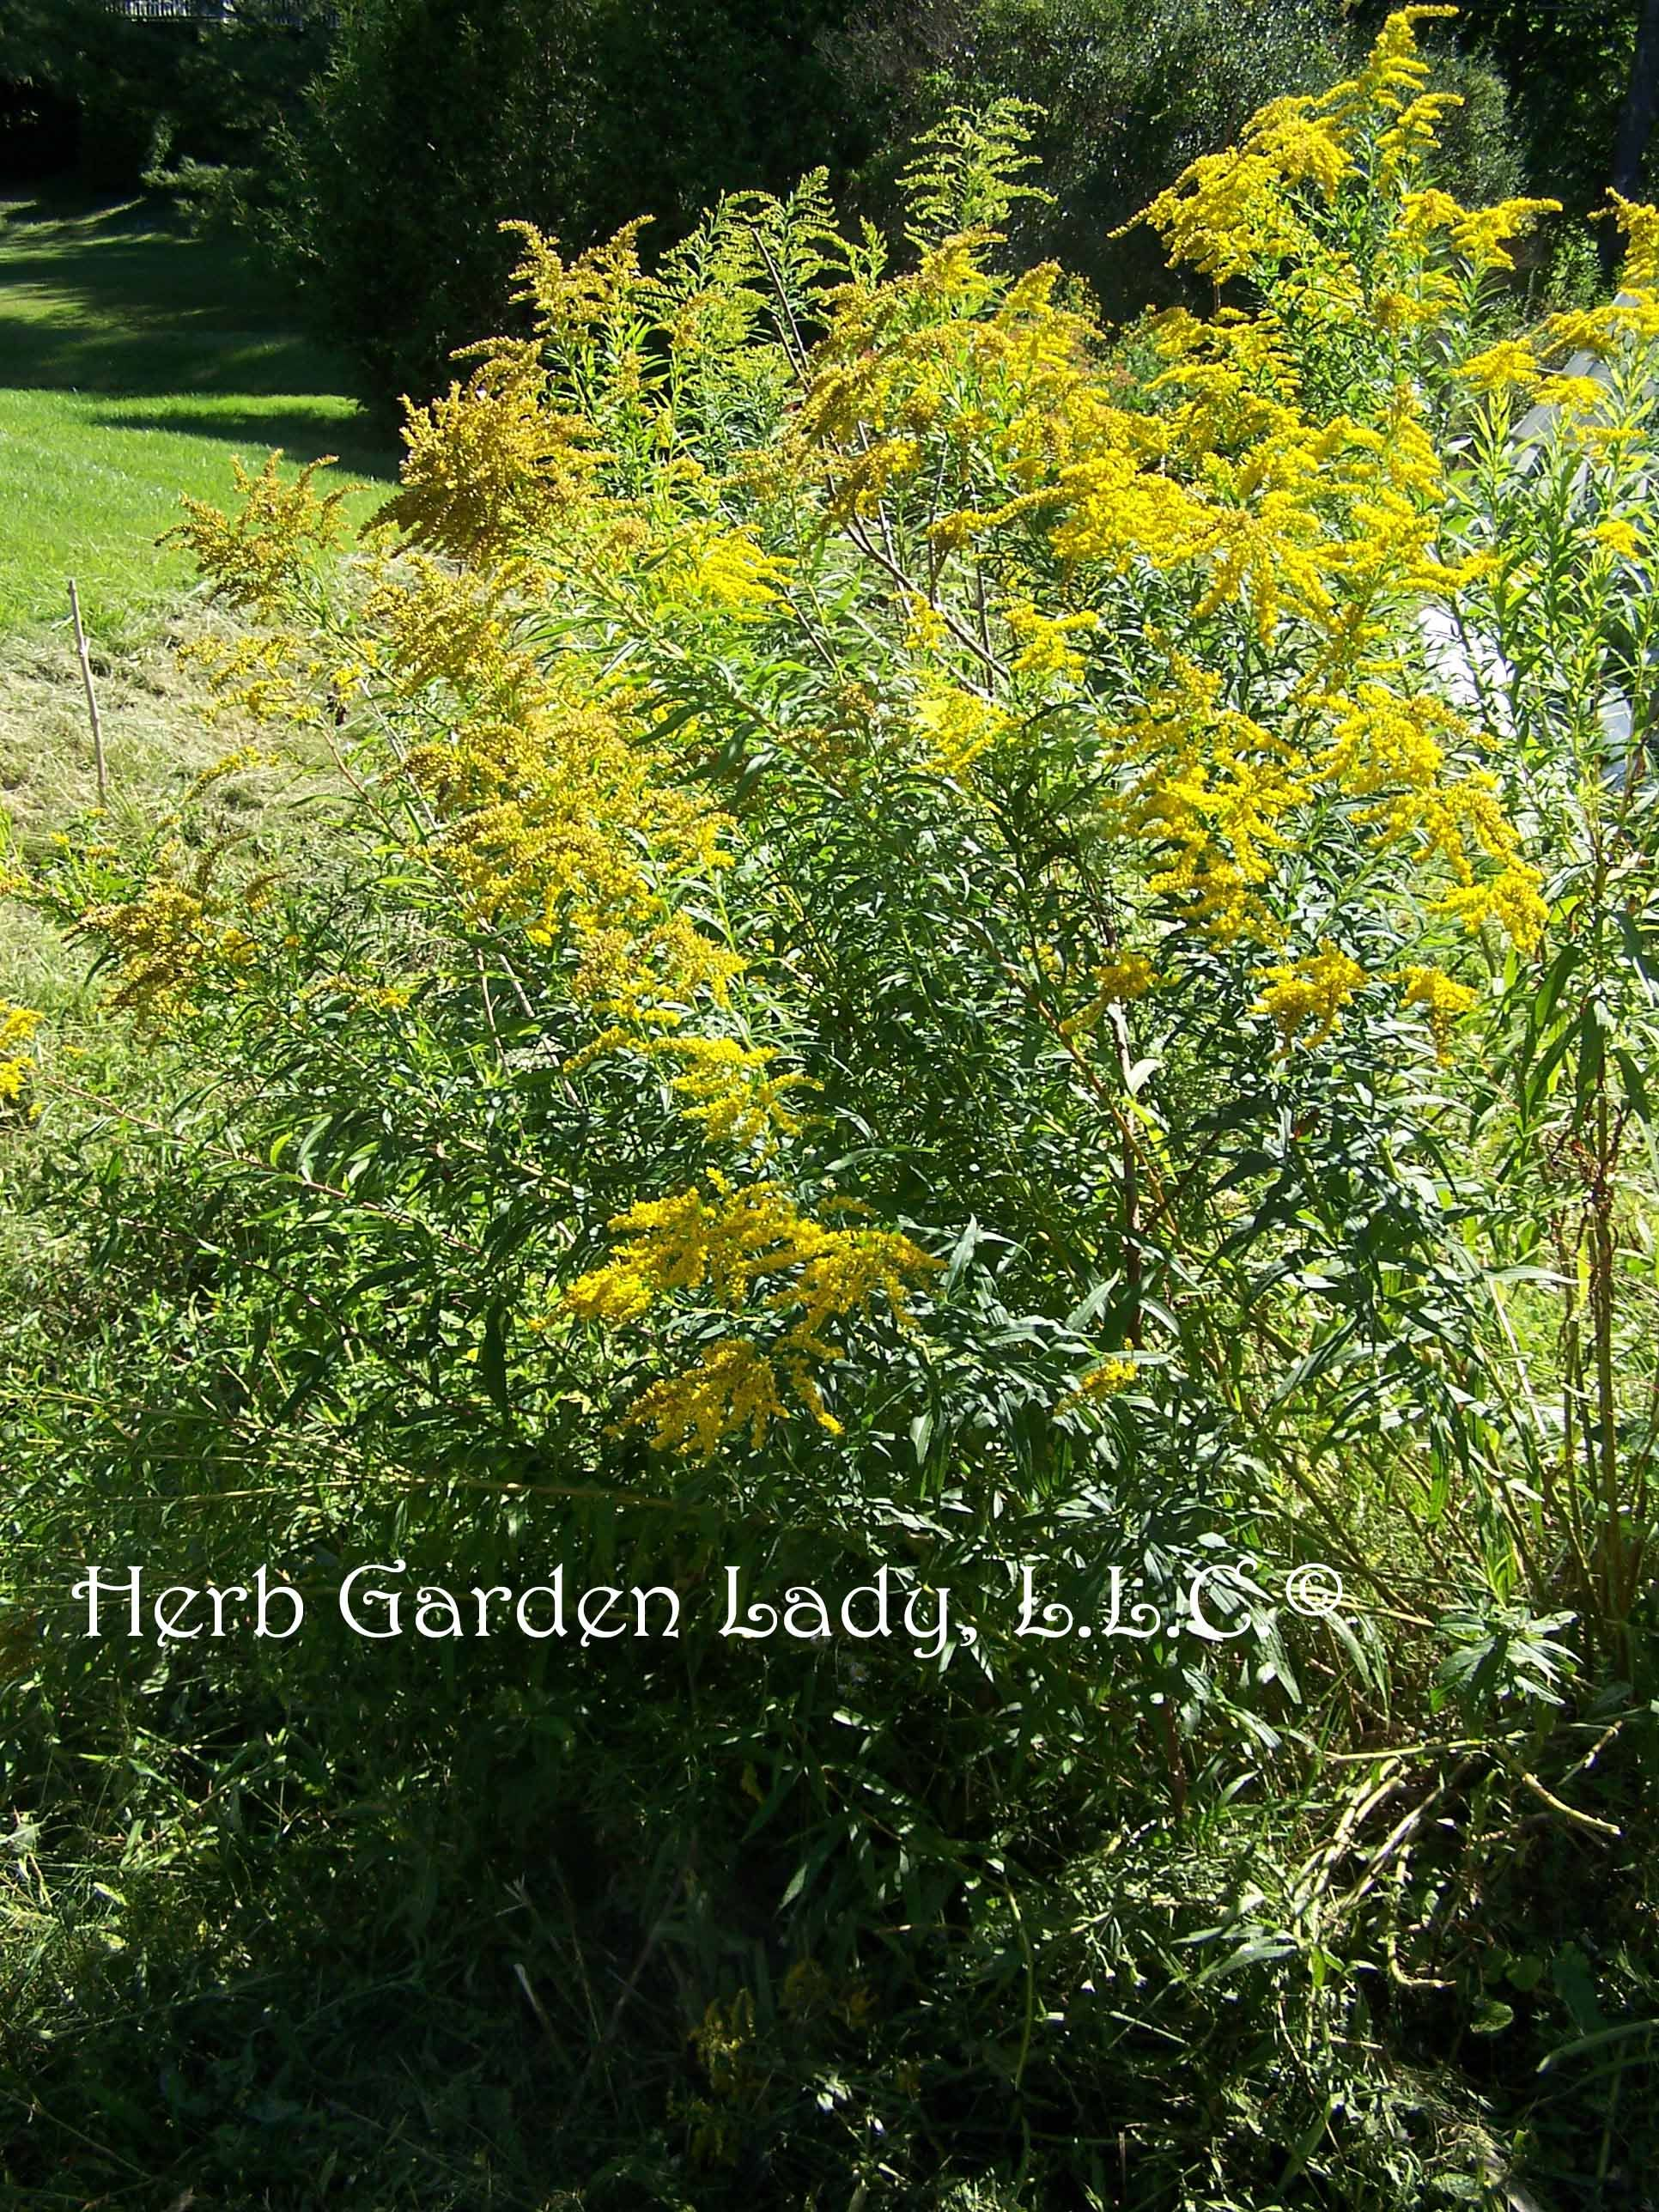 Tansy Tanacetum Vulgare Has Beautiful Tiny Yellow Flowers That